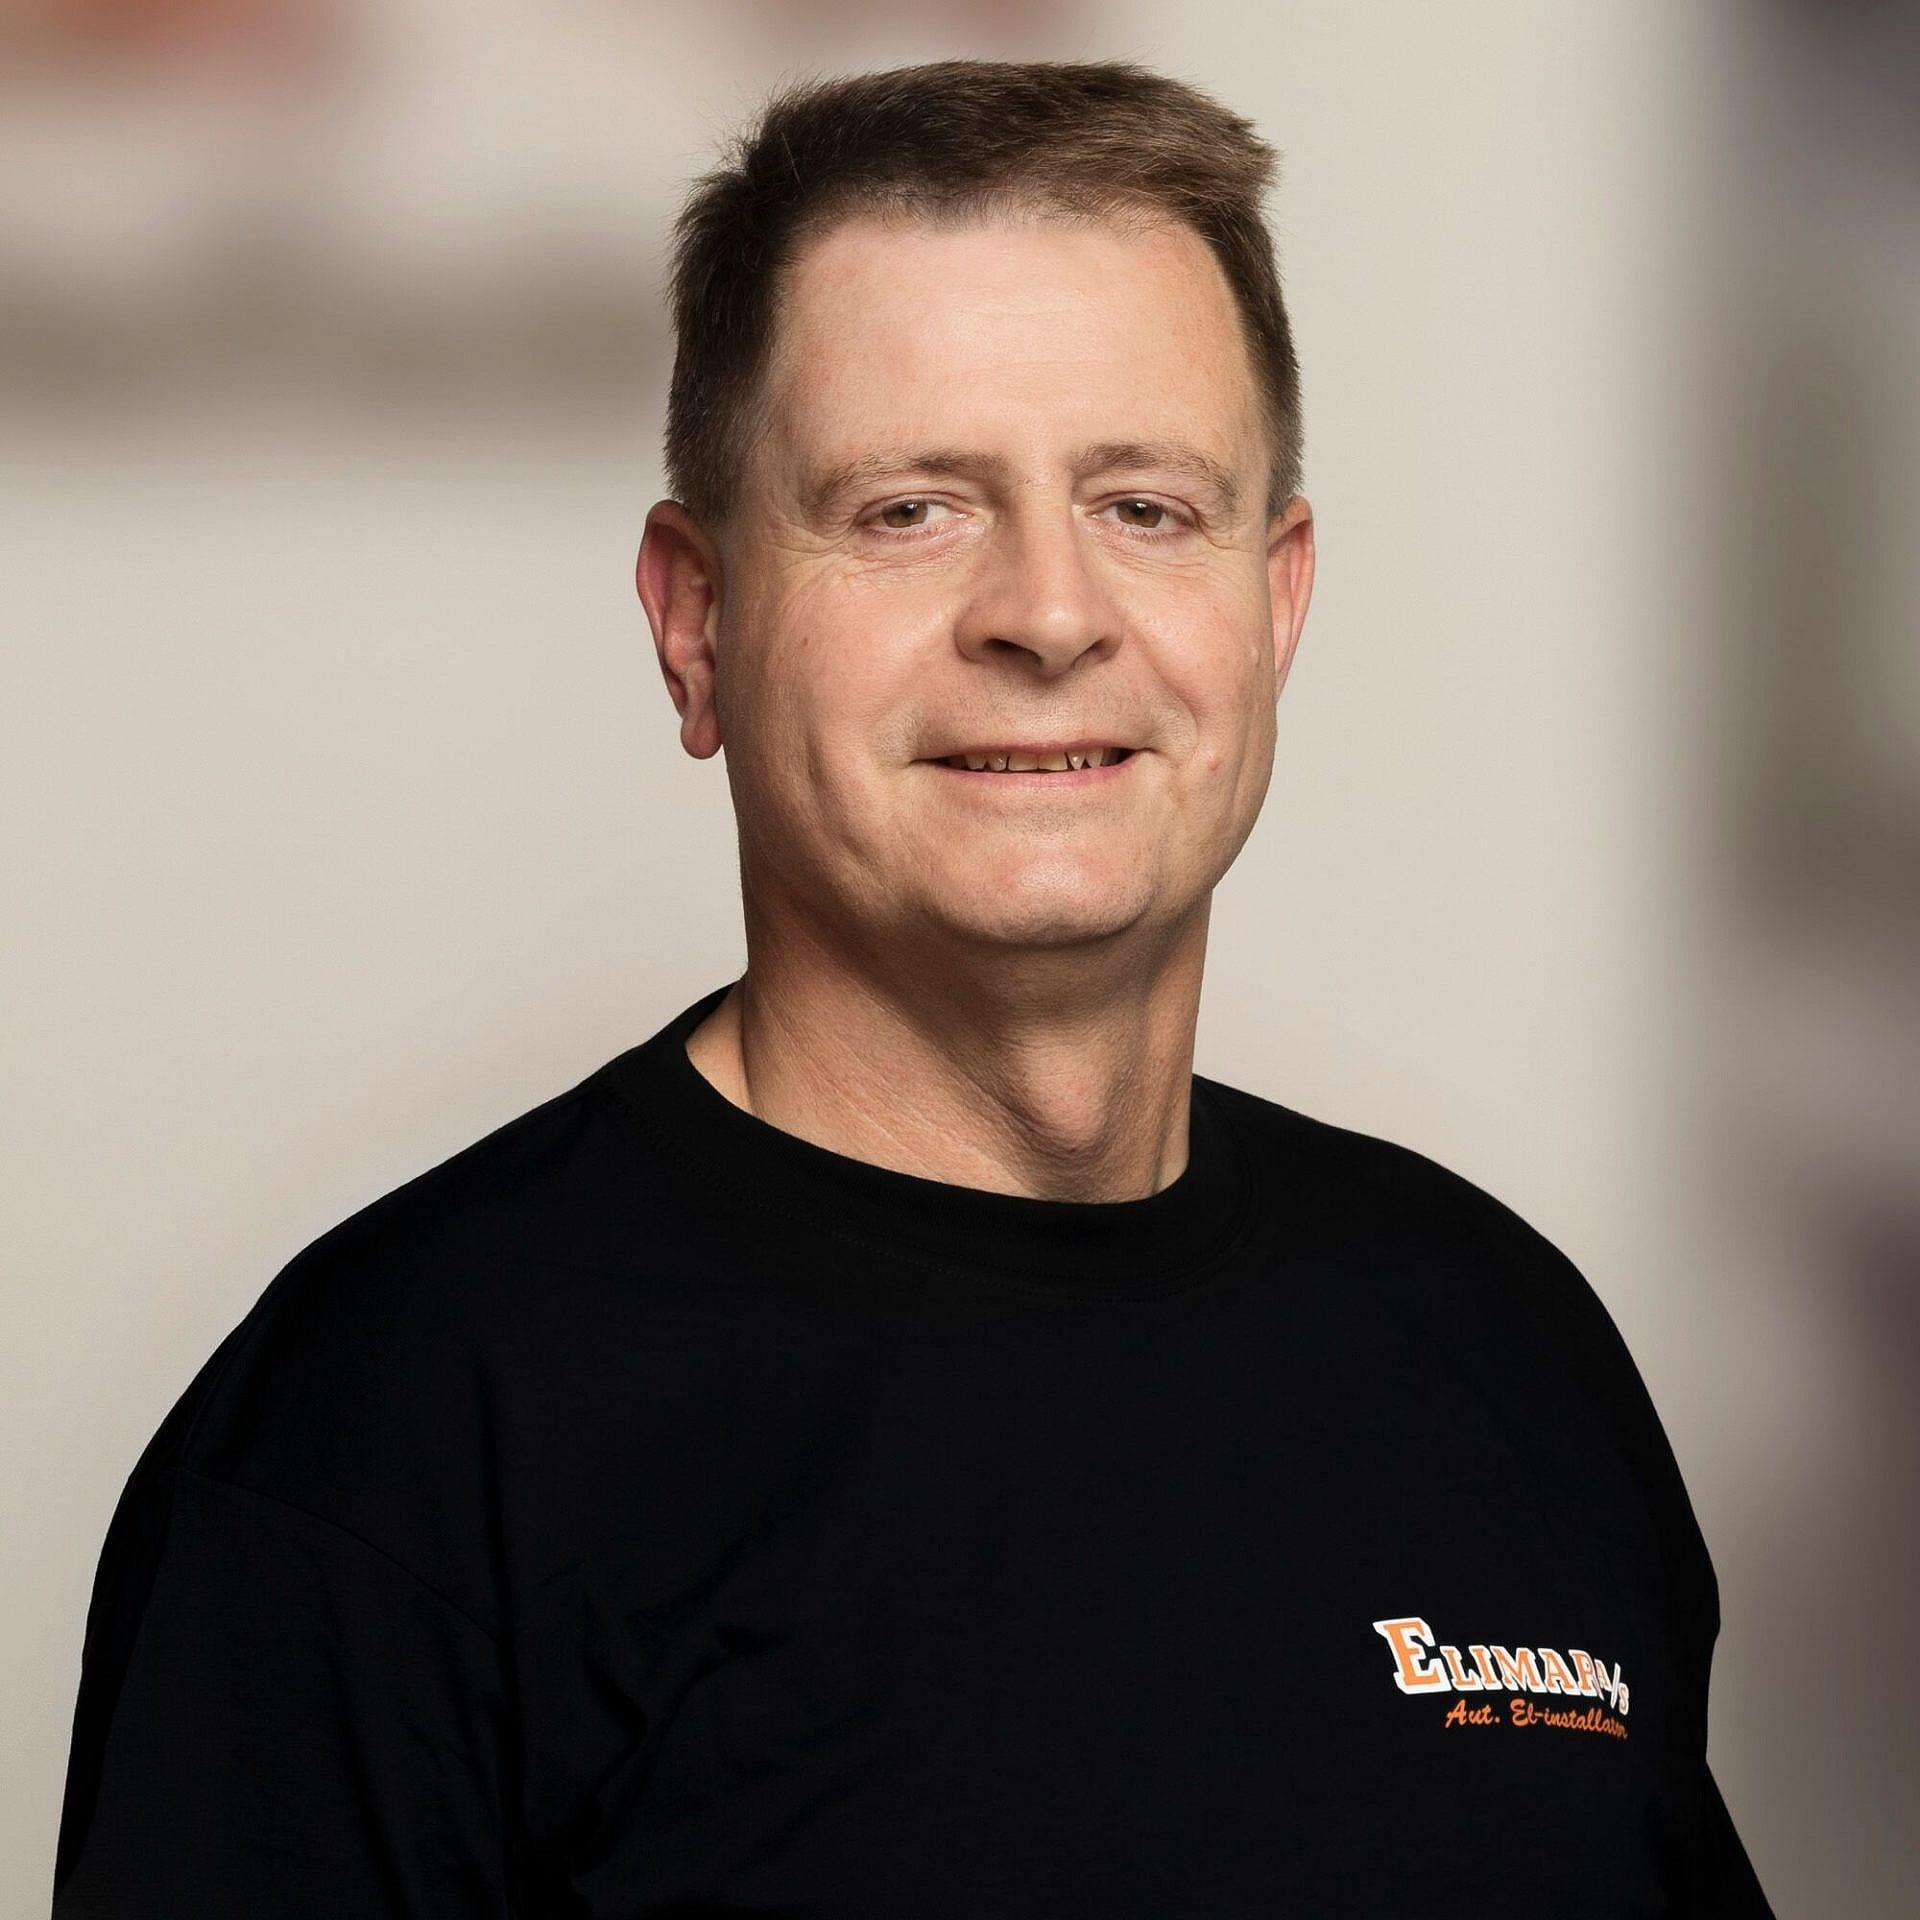 Henrik Birkenfeldt